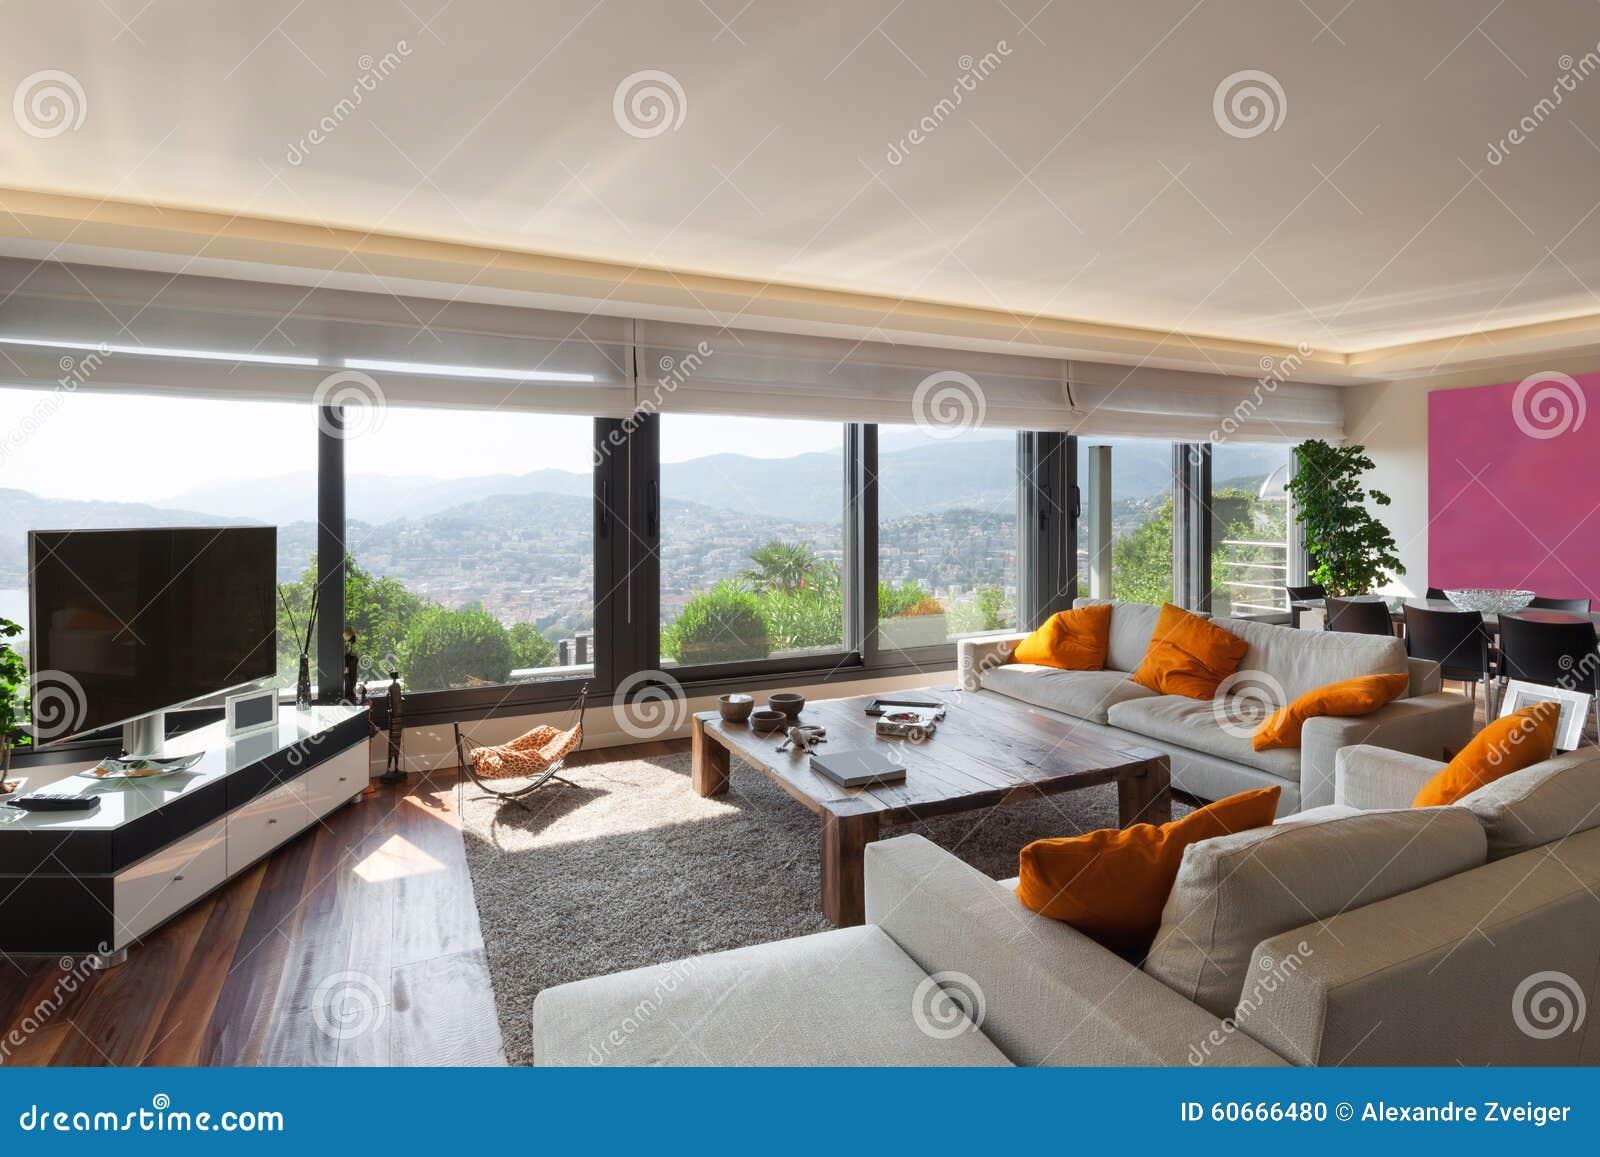 Living Room With A Beautiful Interior Stock Image  : interior beautiful living room luxury apartment 60666480 from cartoondealer.com size 1300 x 957 jpeg 147kB